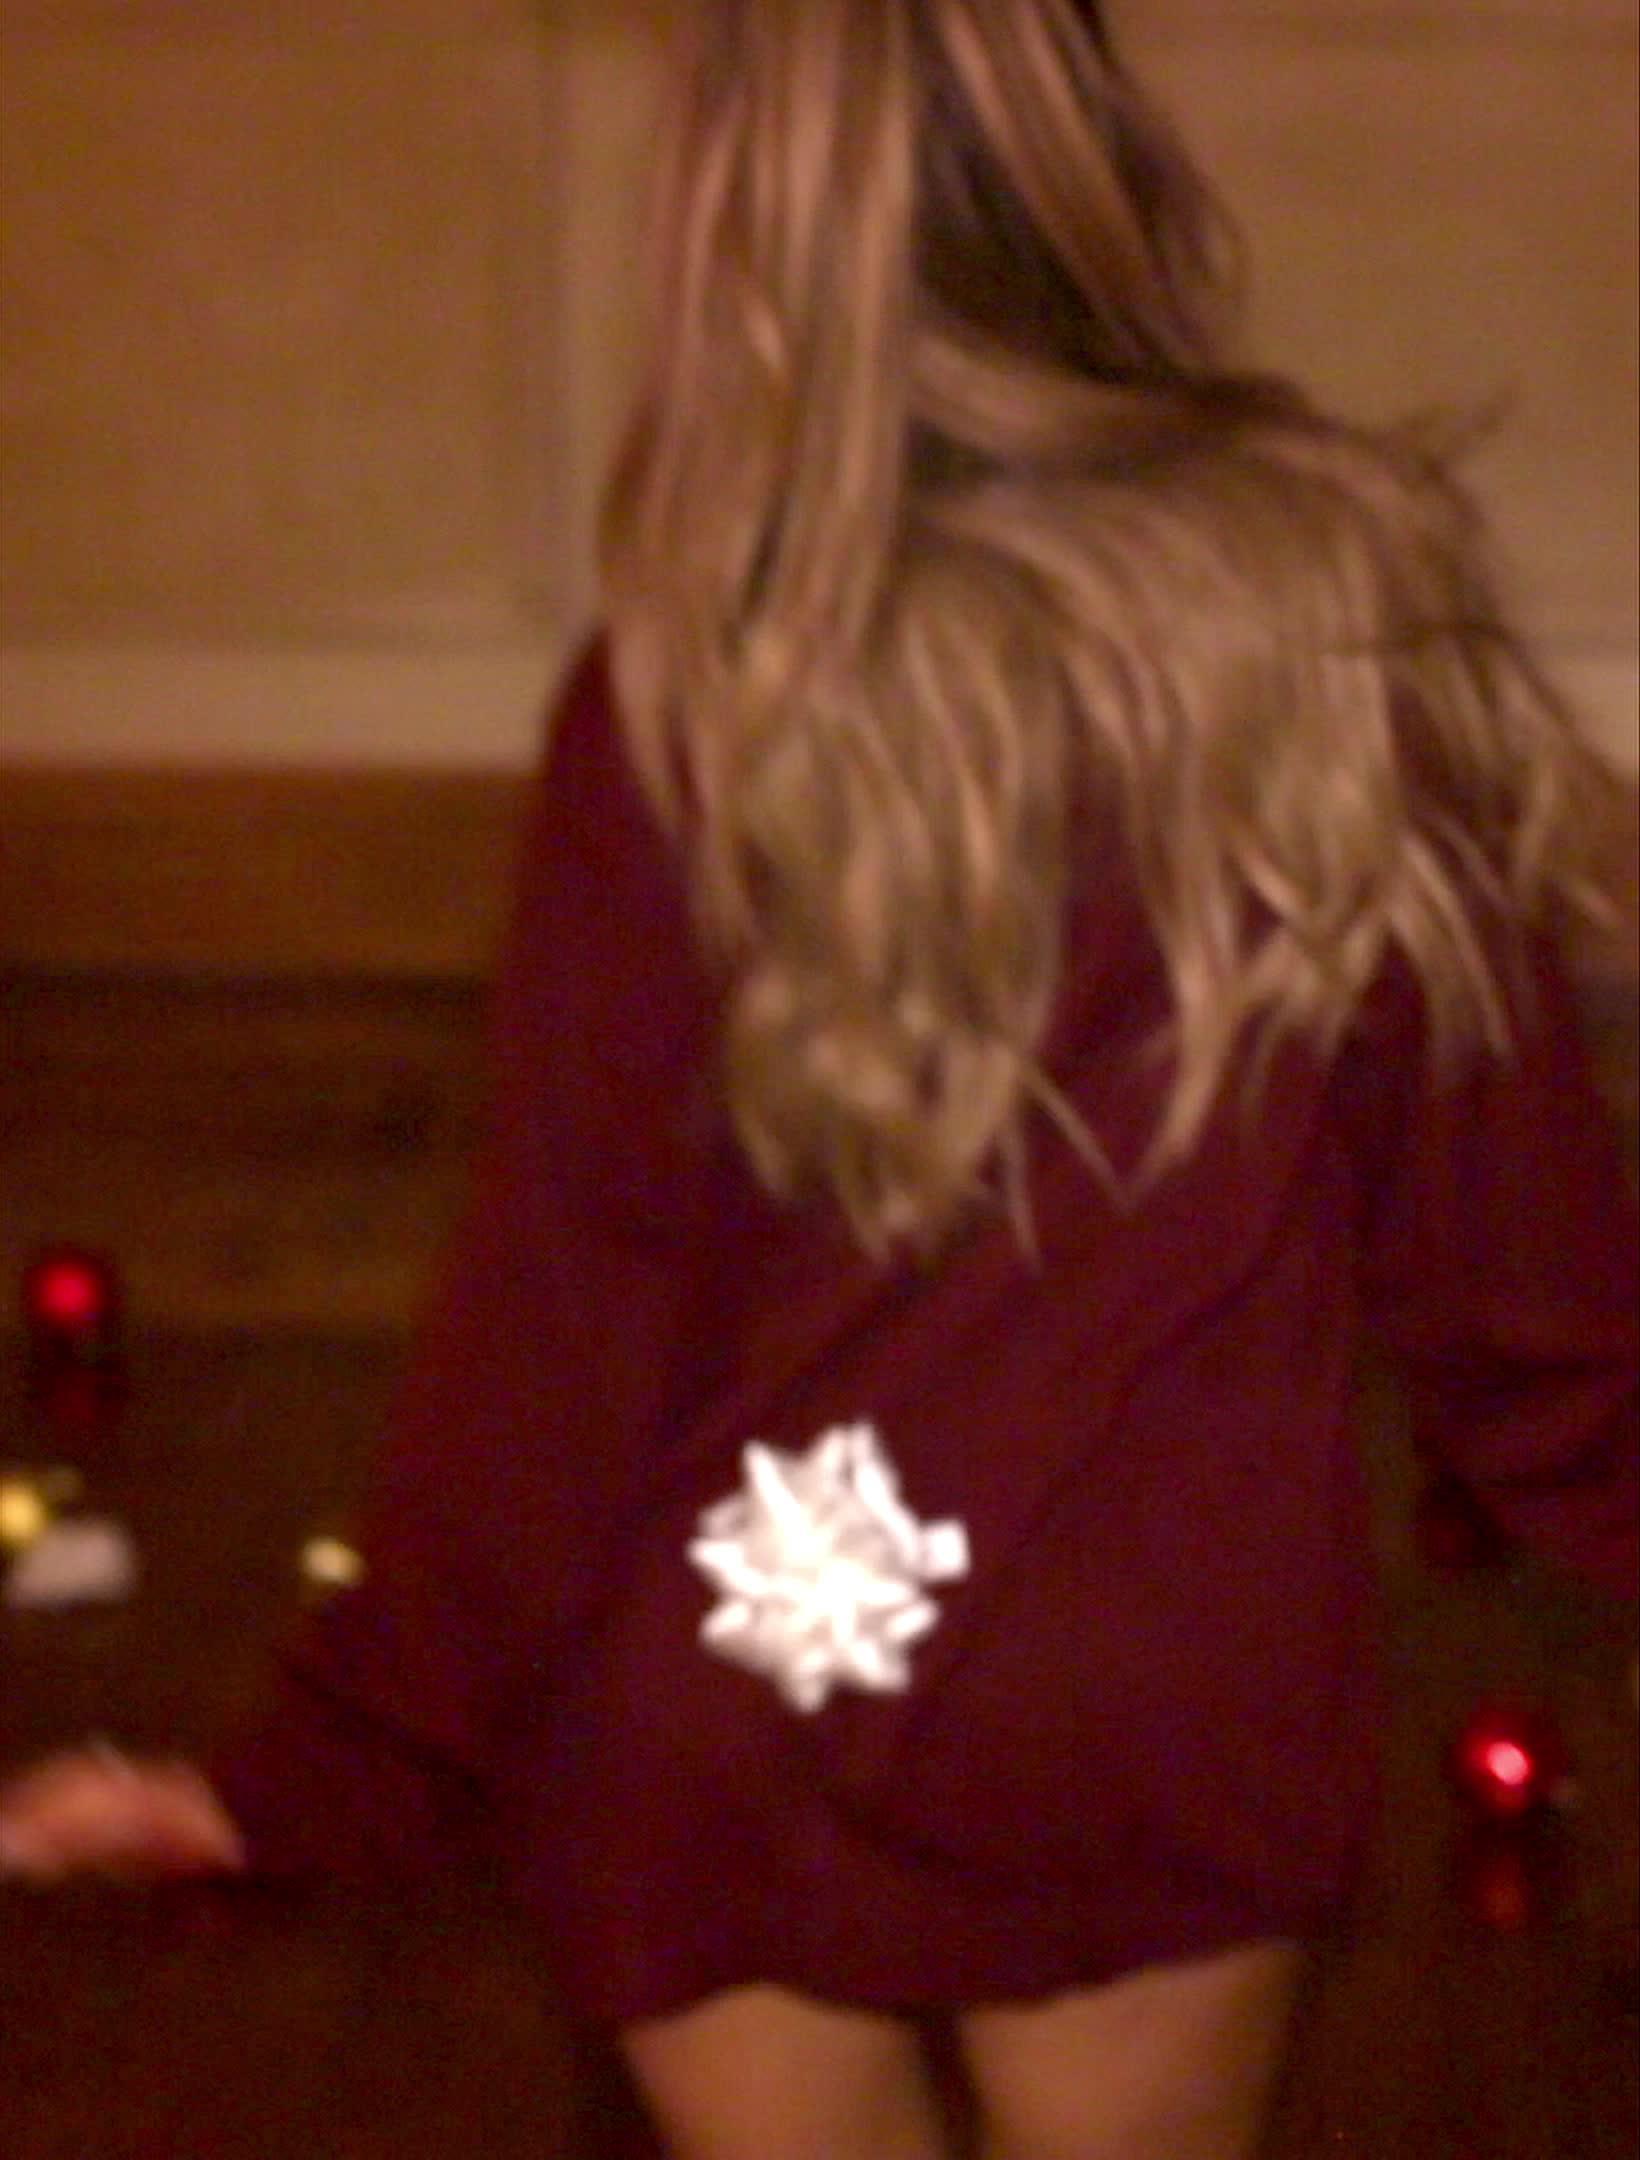 ariana grande, butt, music video, santa tell me, [UHD] Christmas Gift Butt - Santa Tell Me (MV) - 2014 GIFs